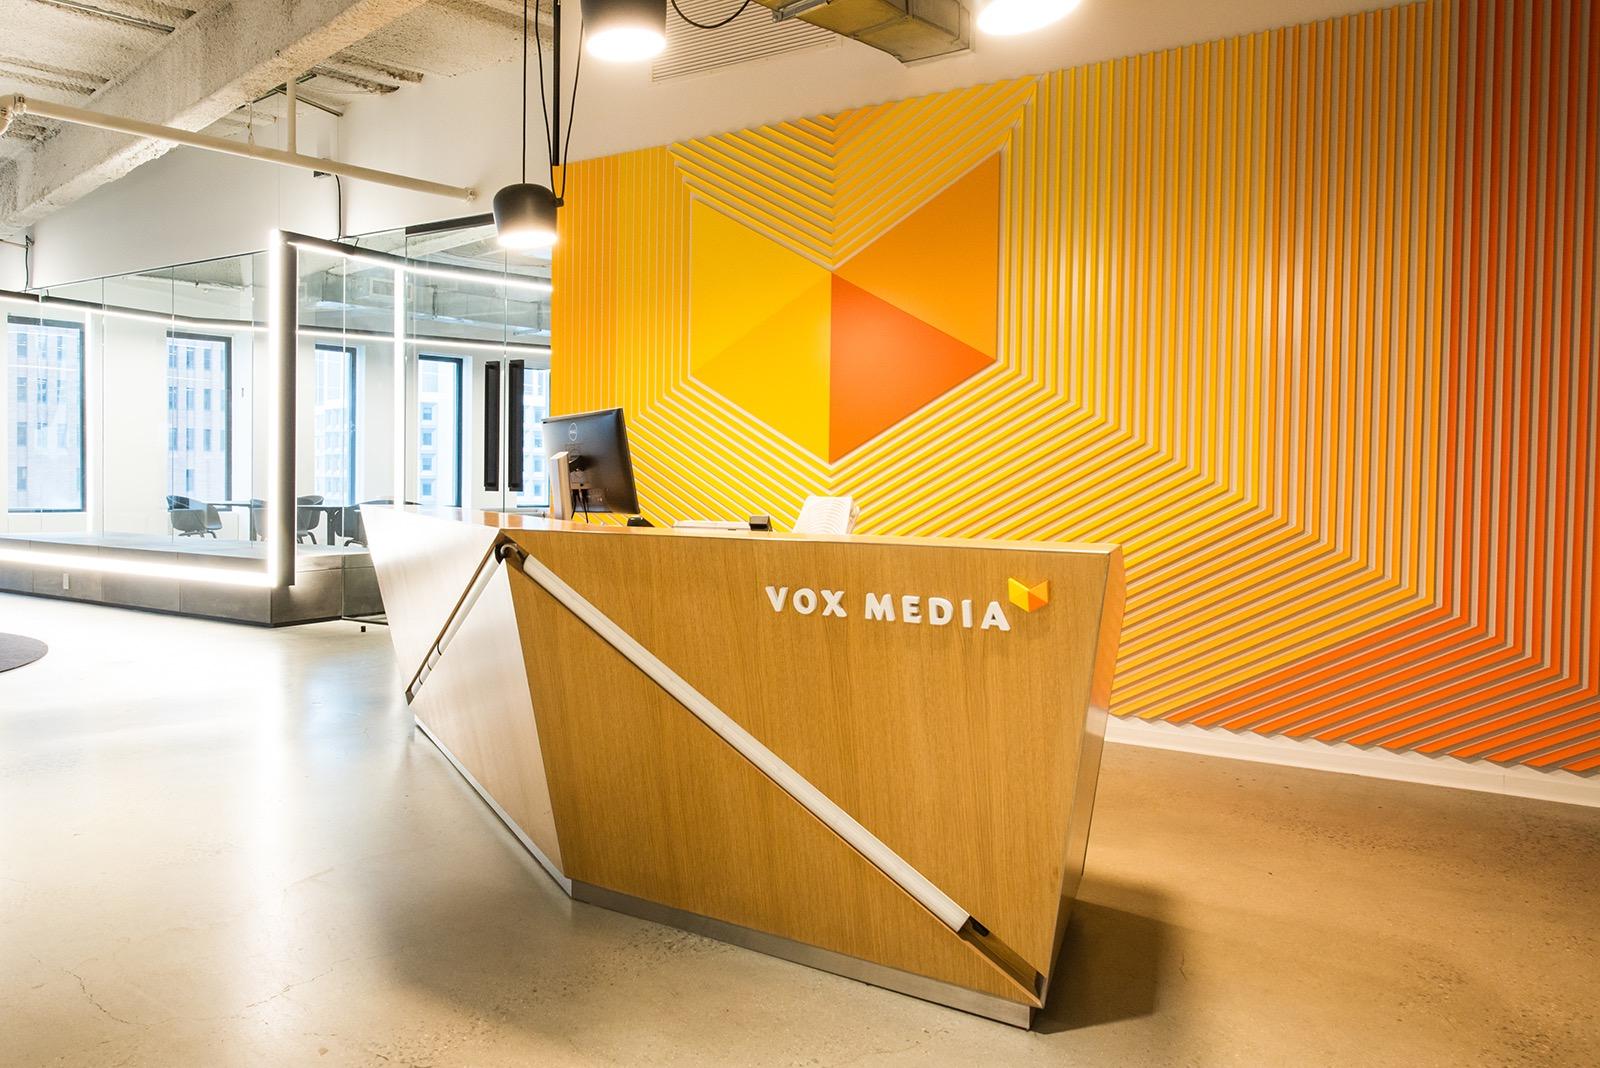 vox-media-nyc-office-1